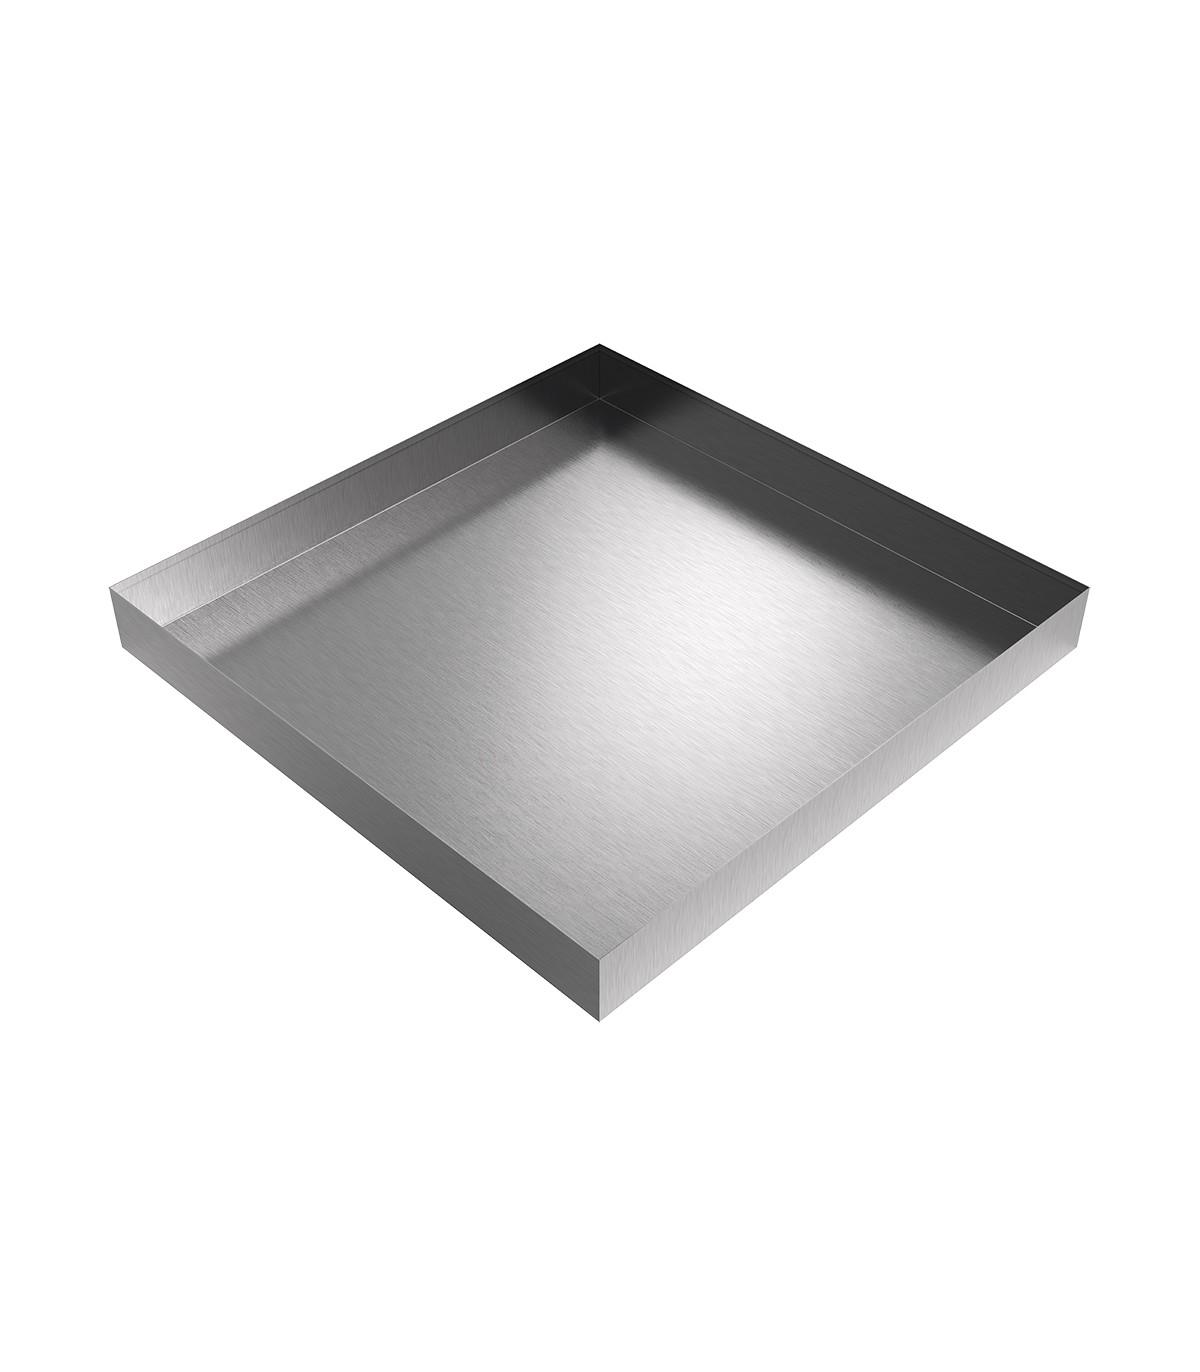 36x36 Stainless Drip Pan